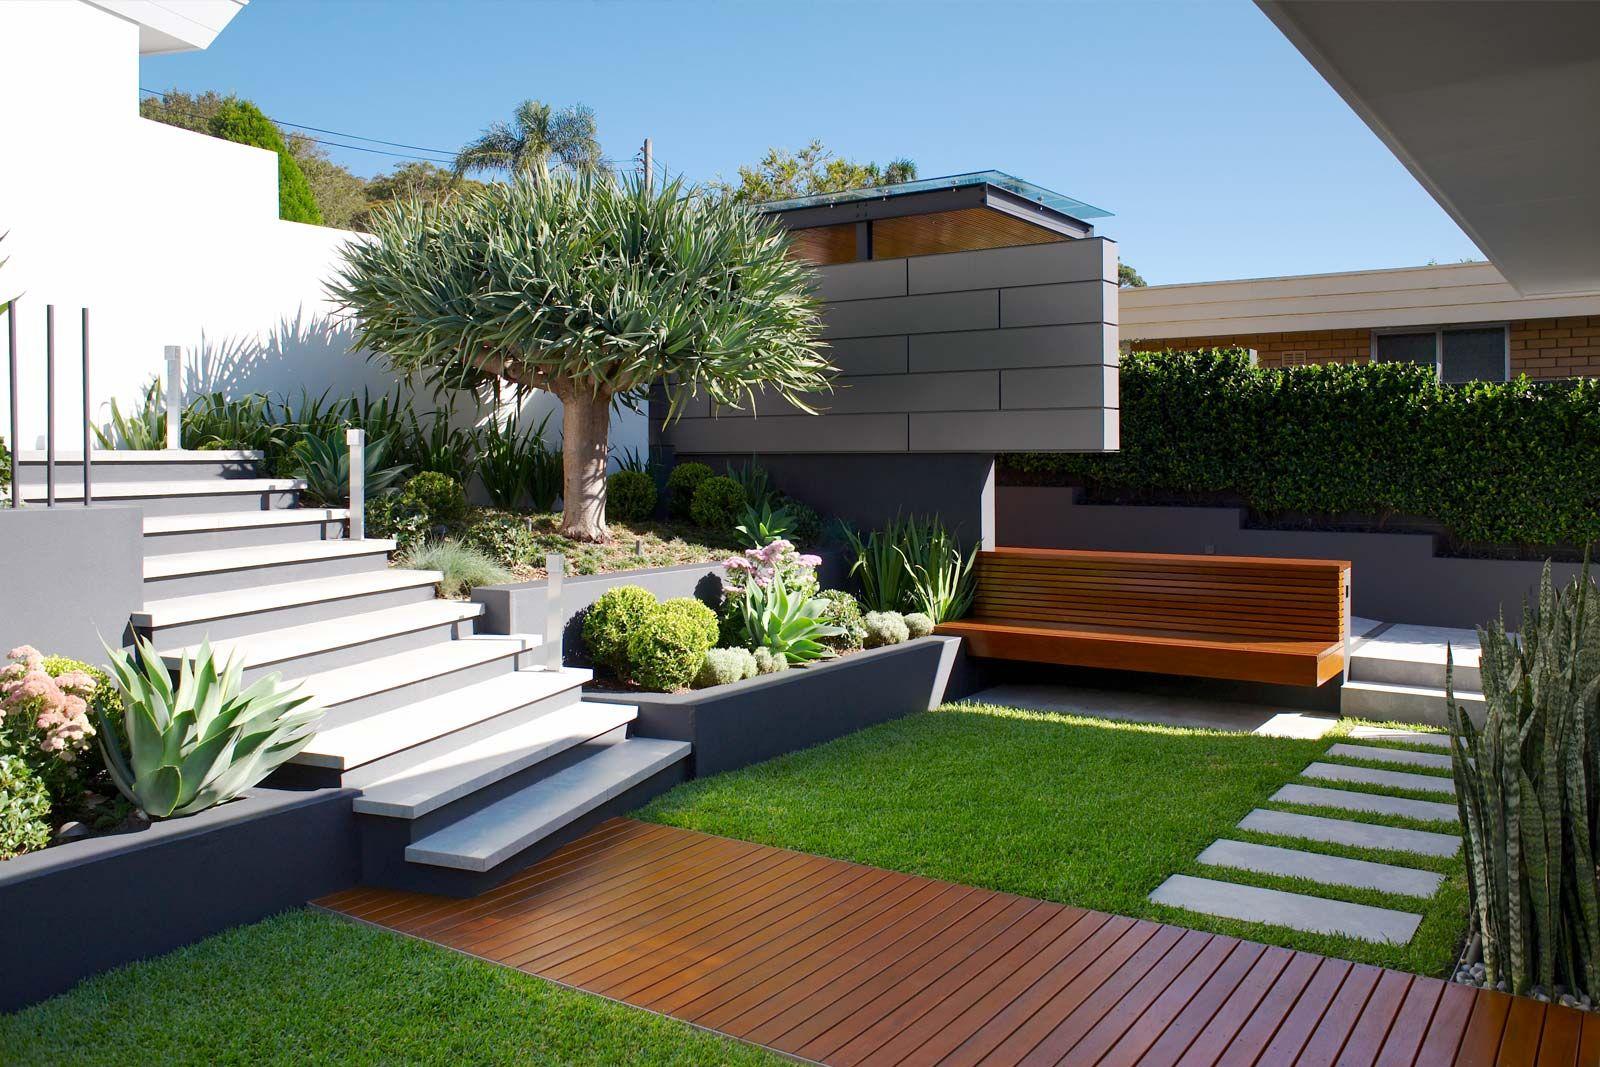 Caringbah Landscape Design By Secret Gardens Sydney Landscape Architects Courtyard Gardens Design Garden Design Landscape Design Modern backyard ideas australia